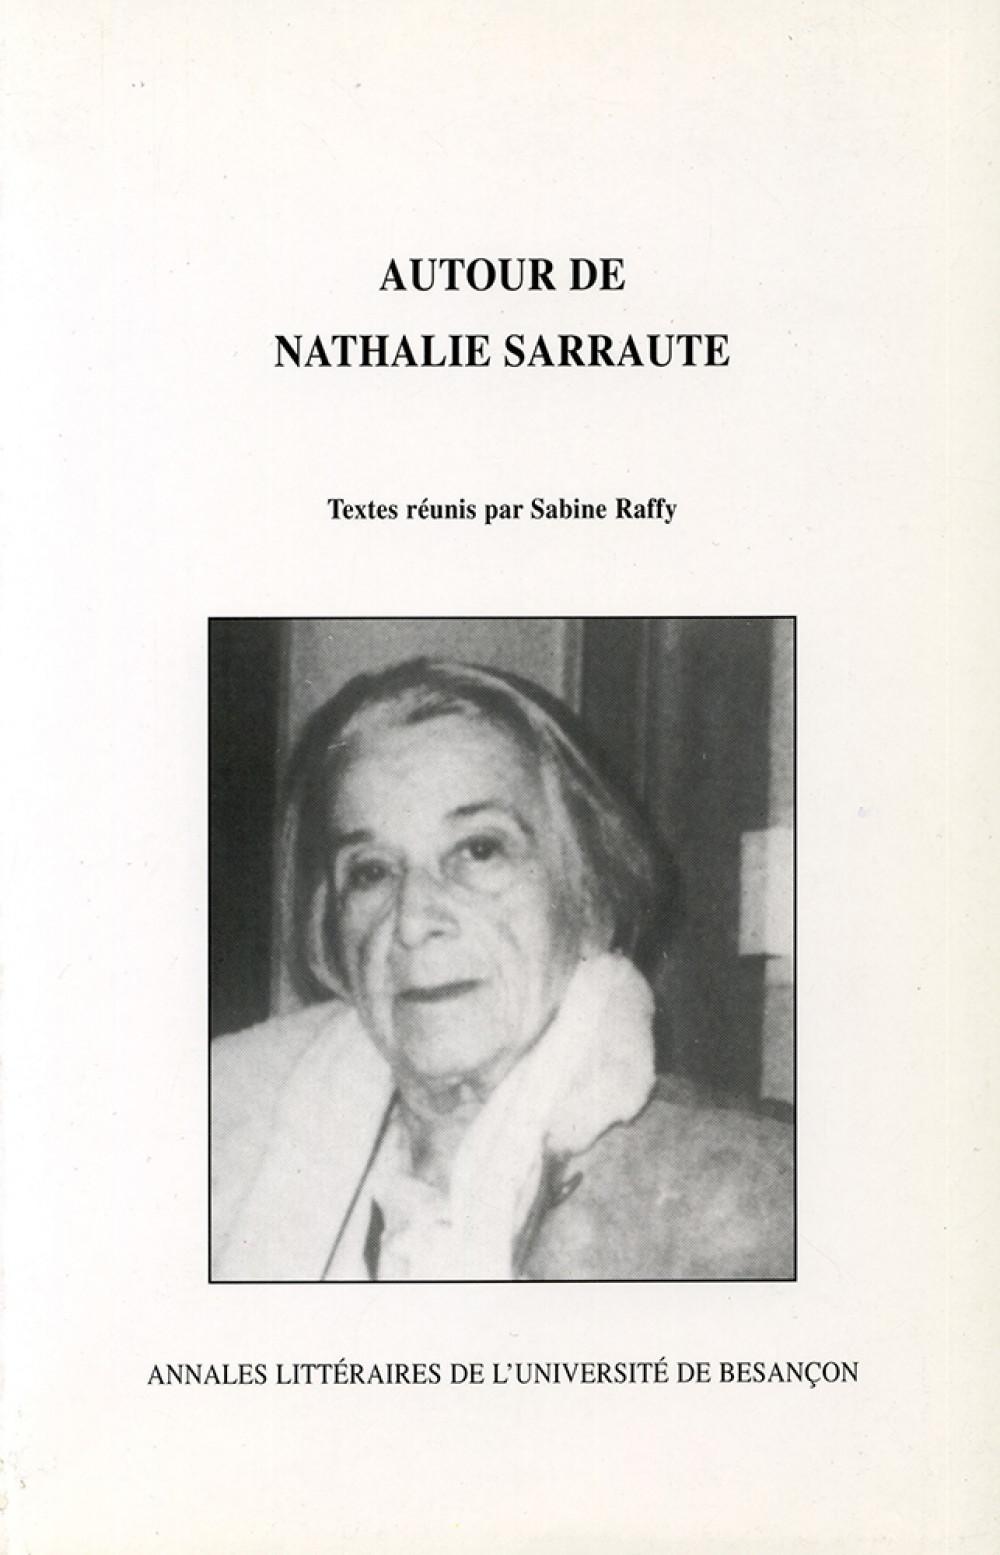 Autour de Nathalie Sarraute